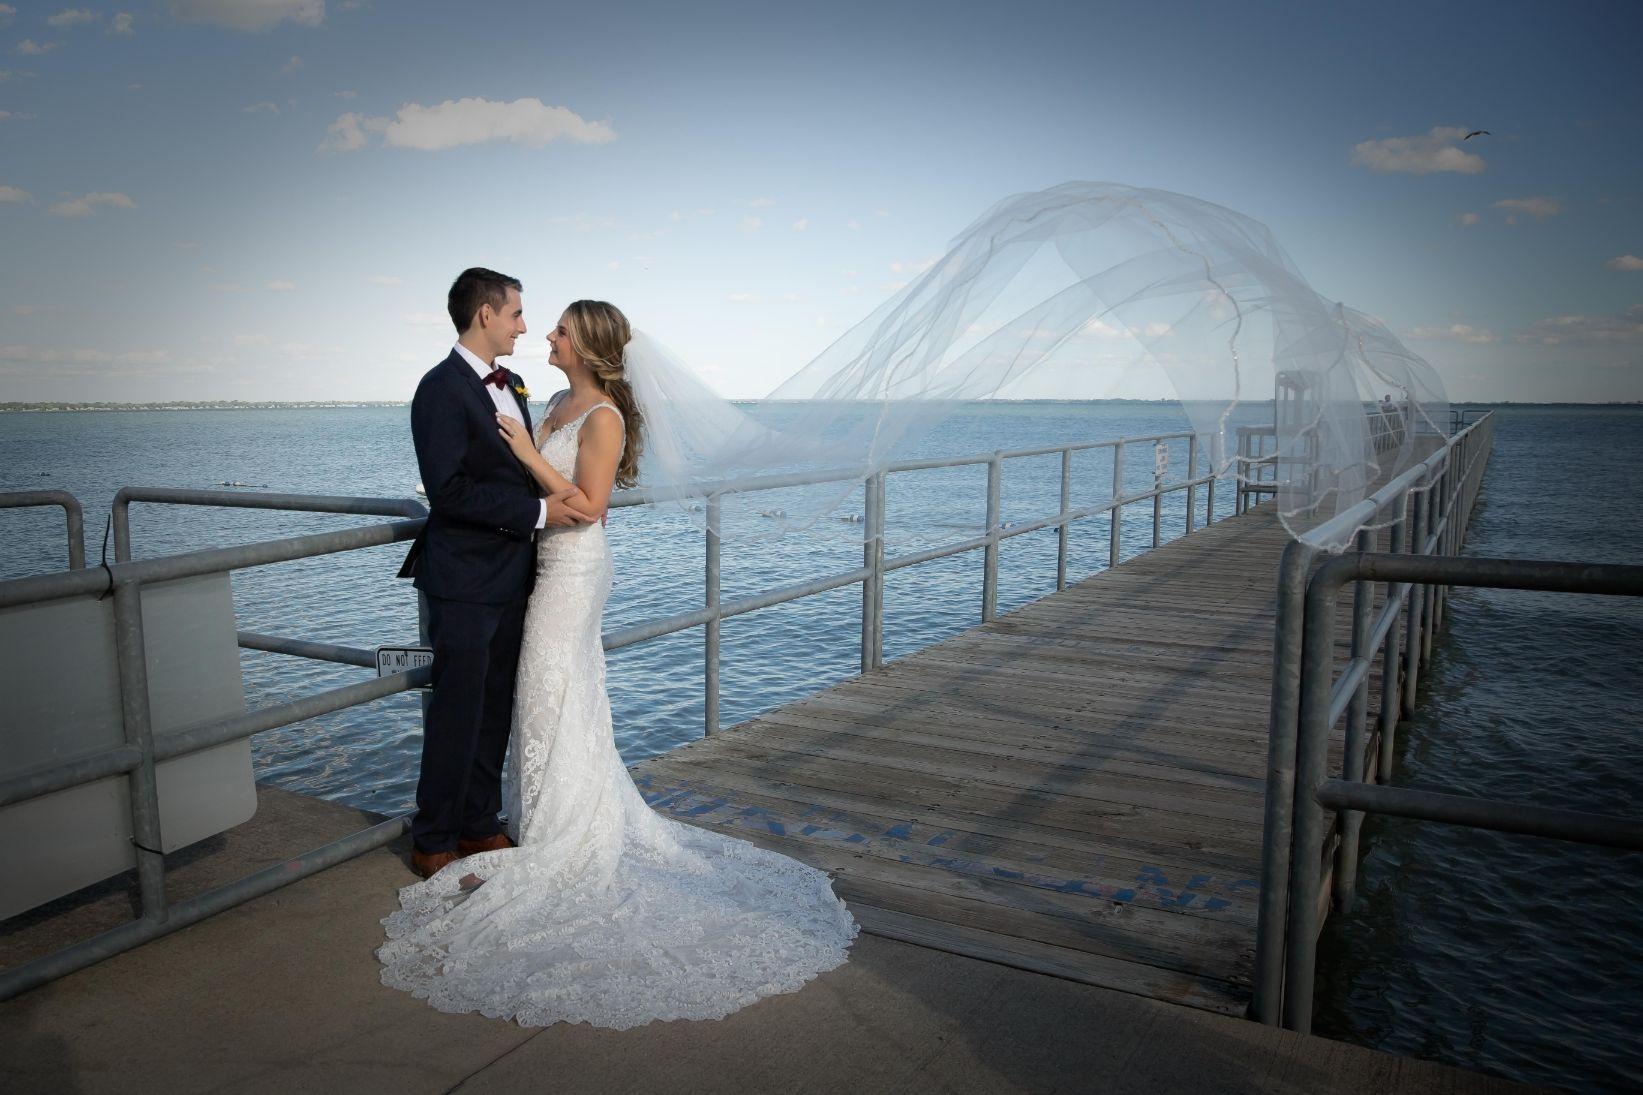 Tessa and Andrew romantics at waterfront 1